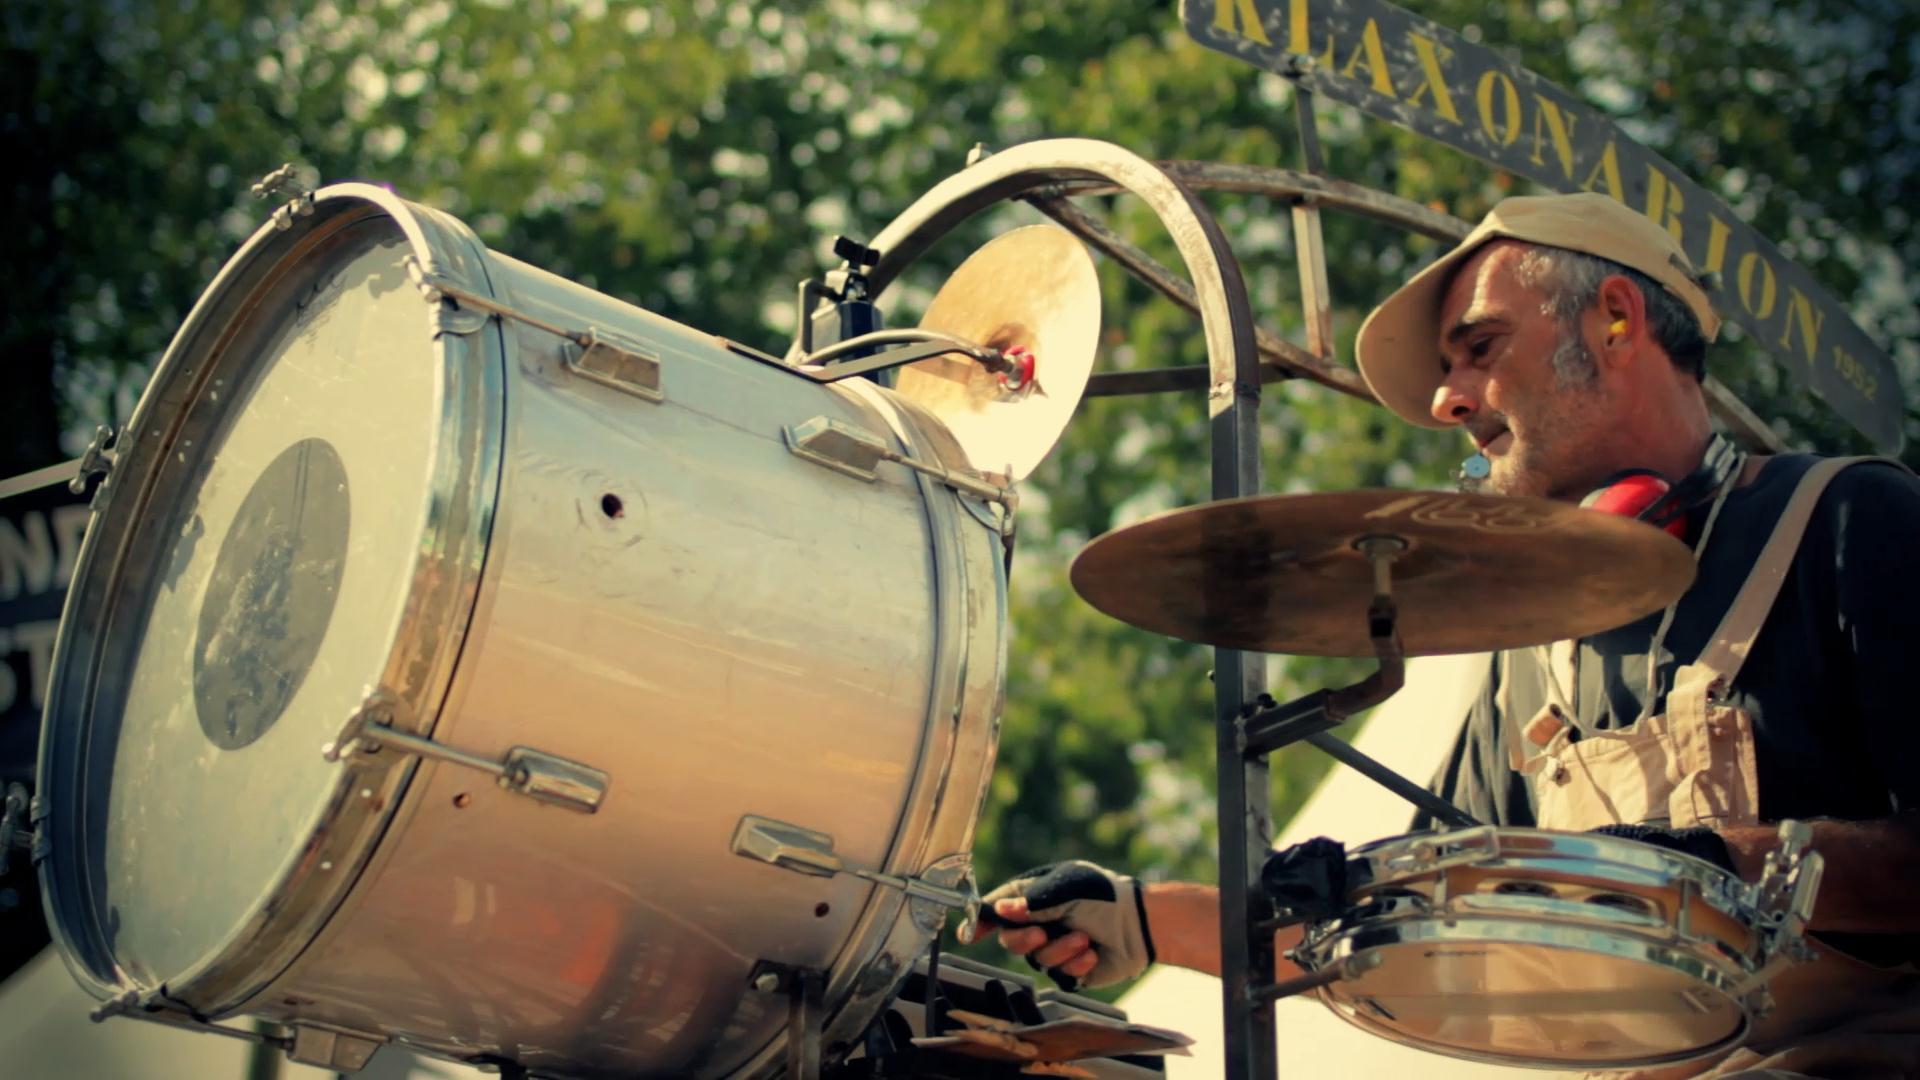 Eurockéennes Music Festival 2011